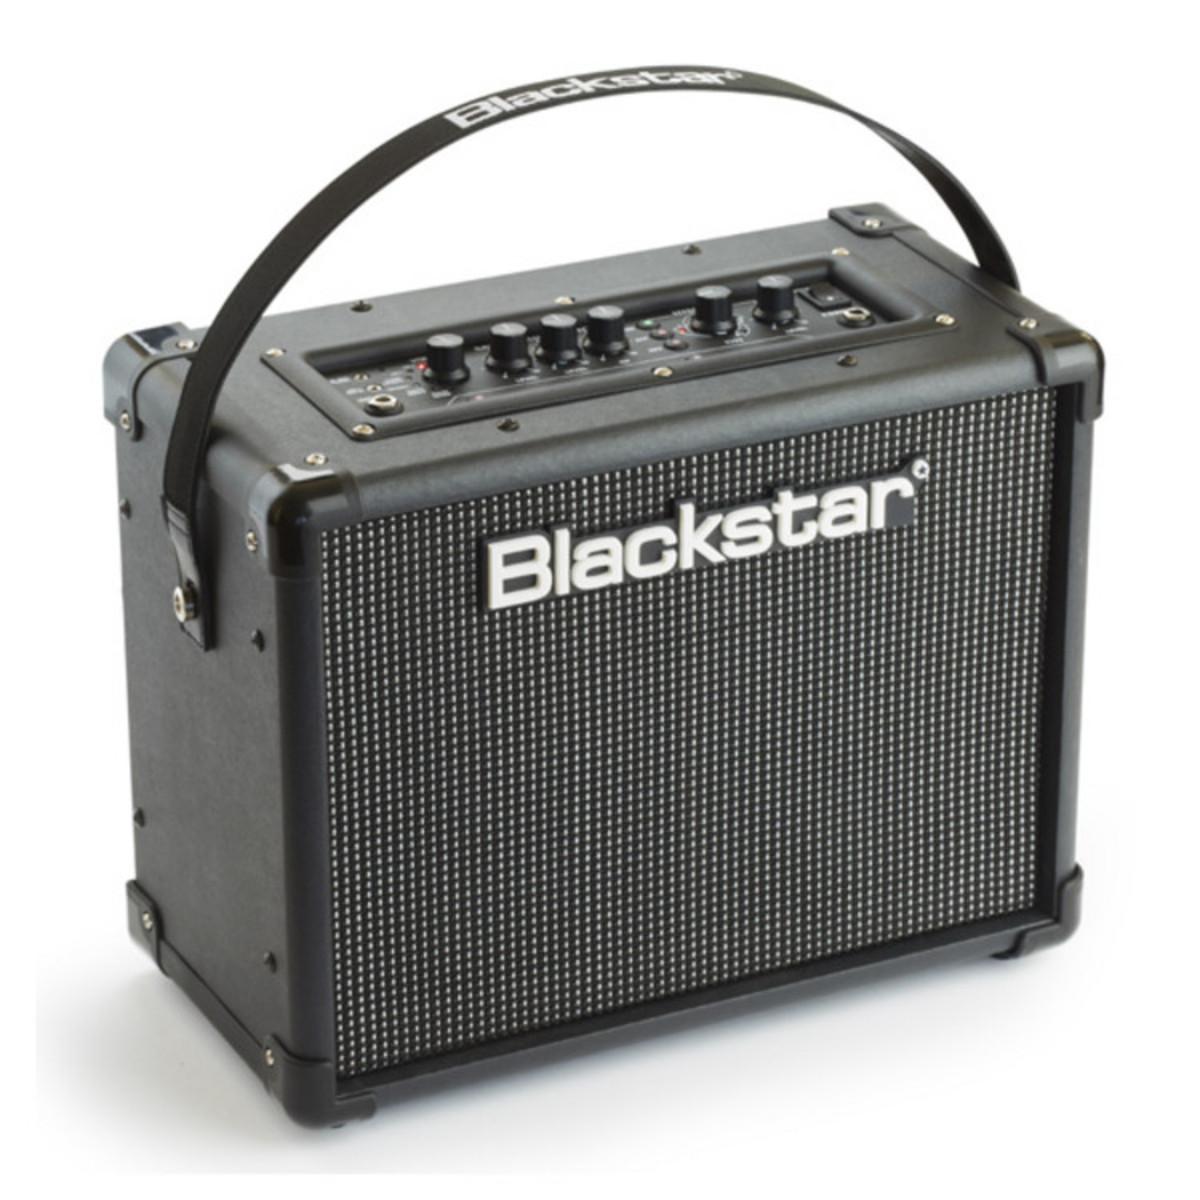 Image of Blackstar ID:Core 20 Stereo 20 Watt (2x10W) Combo Amp